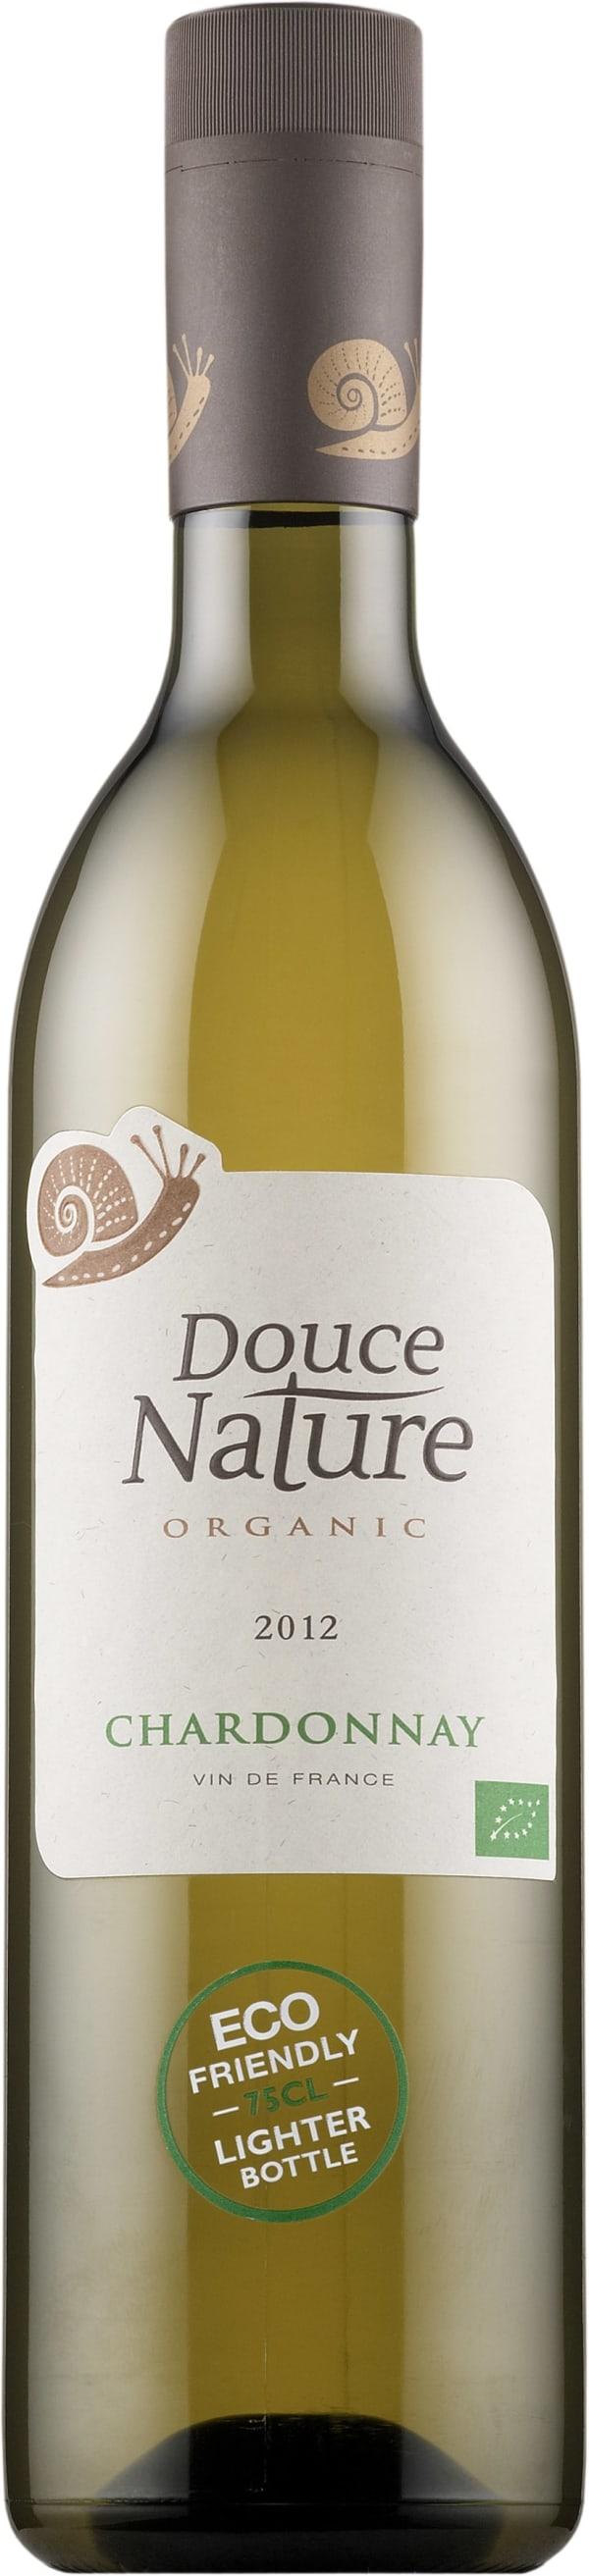 Douce Nature Organic Chardonnay 2015 plastic bottle